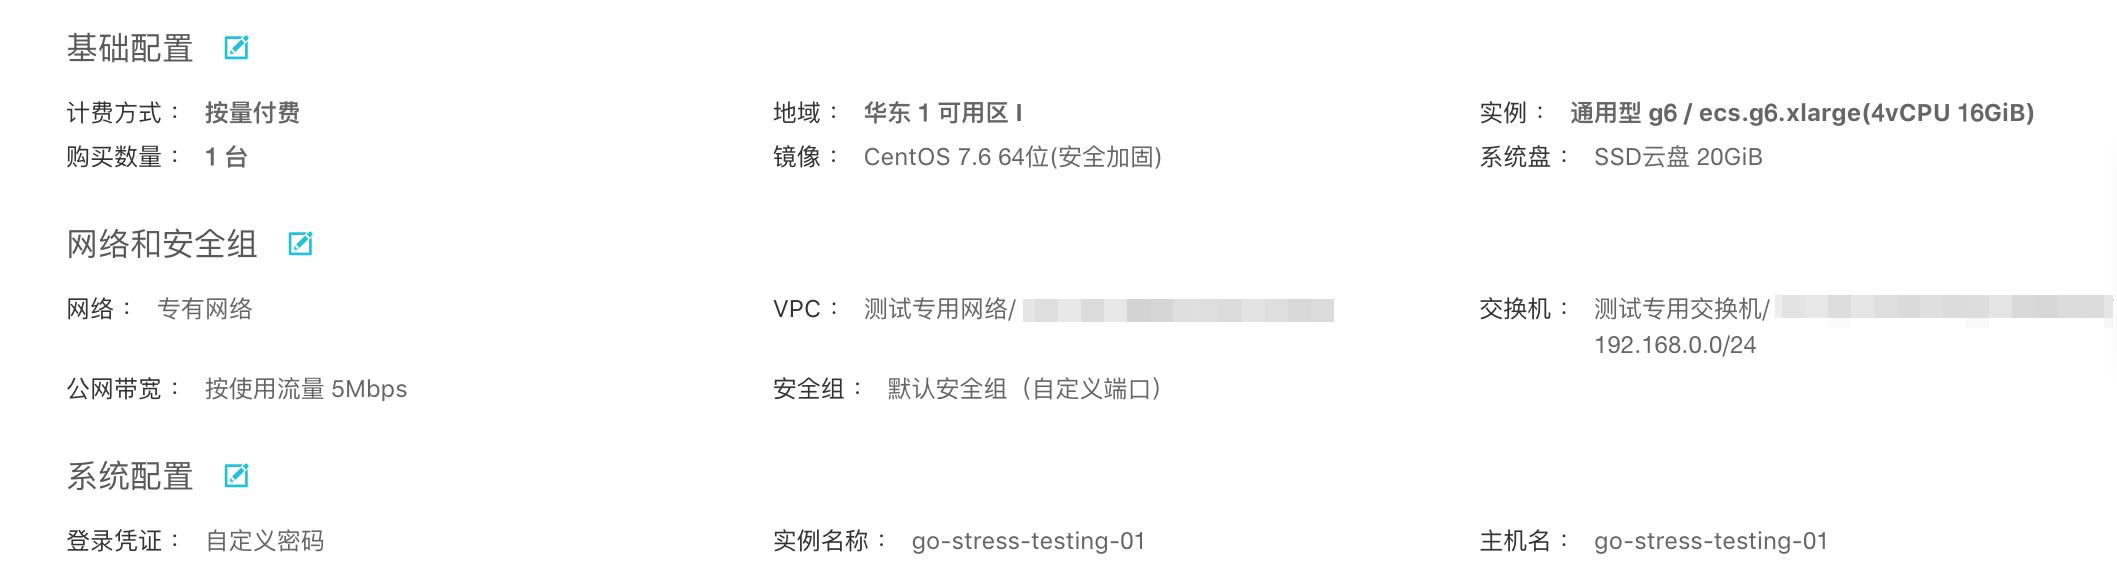 go-stress-testing01